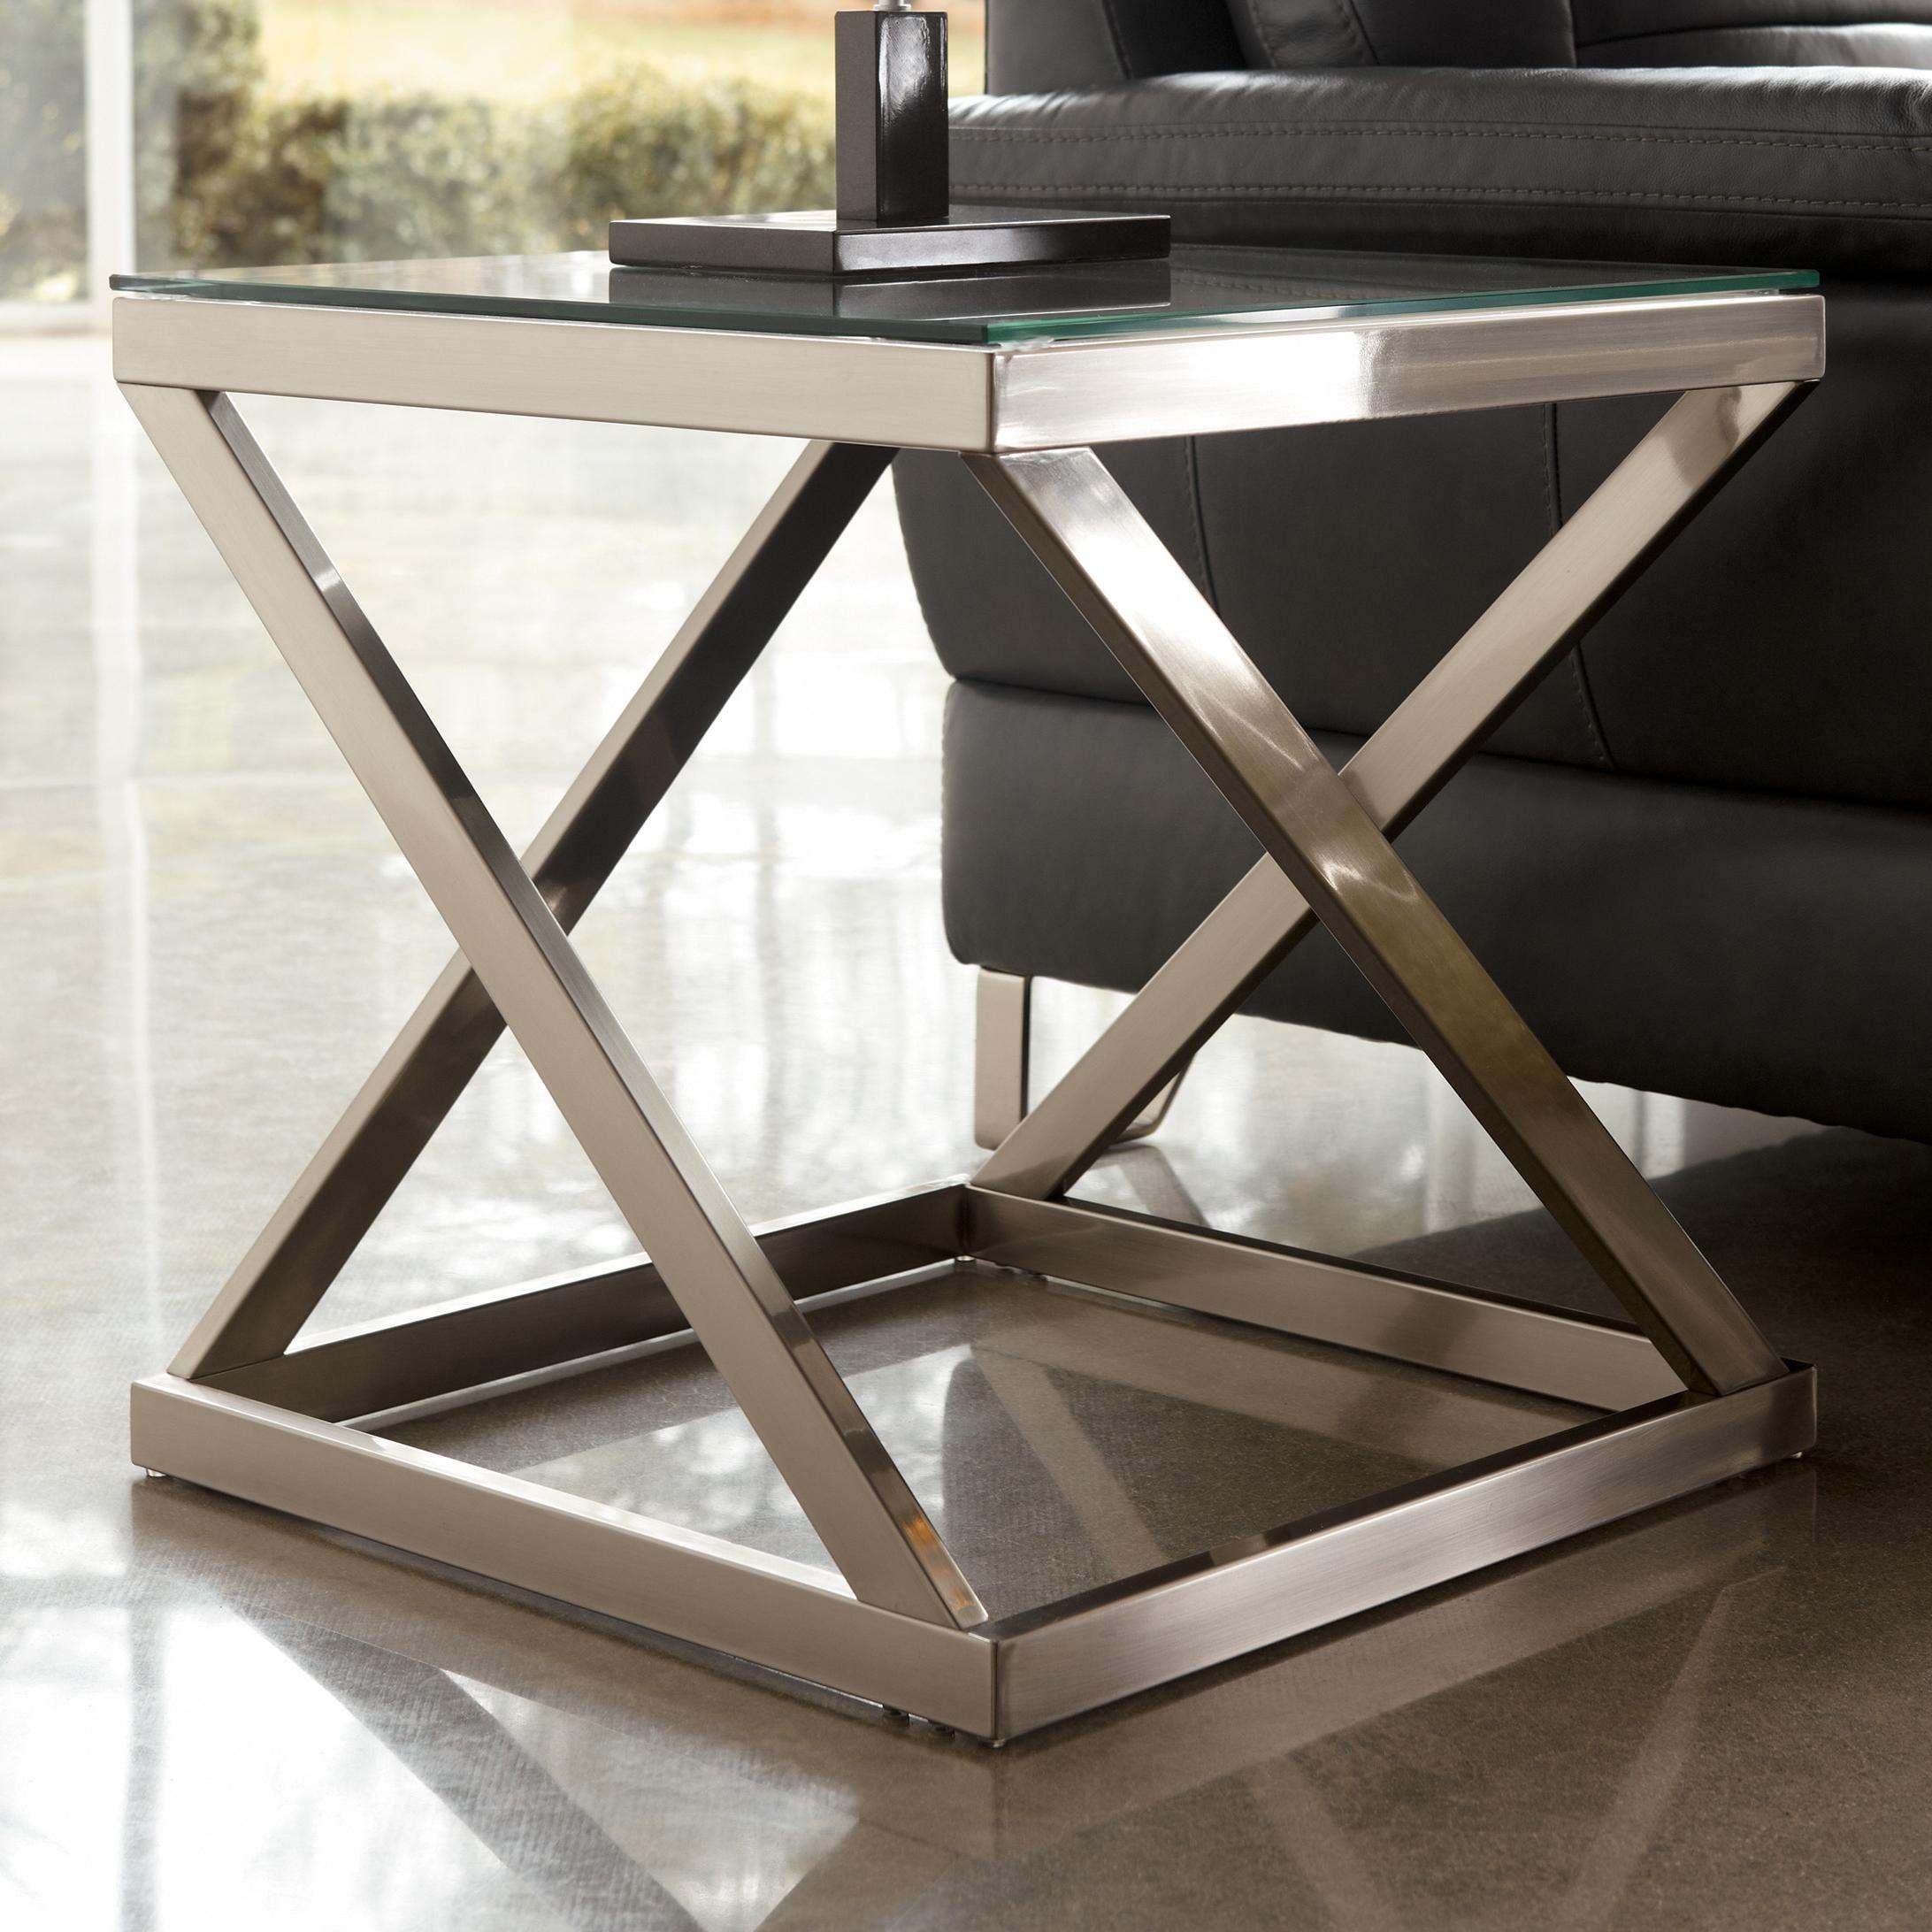 Superb Signature Design By Ashley Coylin Square End Table VA, MD U0026 DC $159